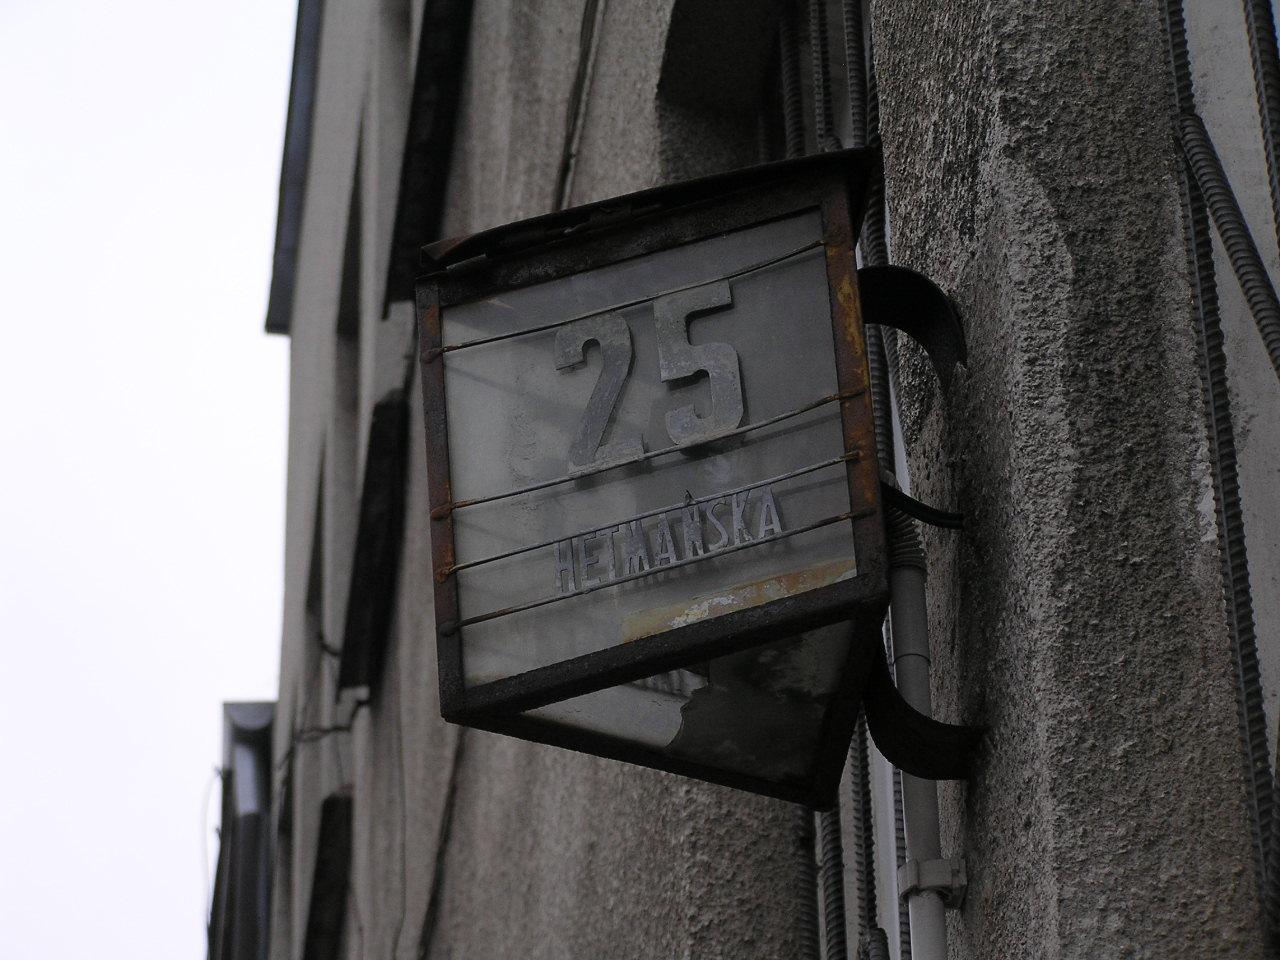 Latarenka adresowa - Hetmańska 25